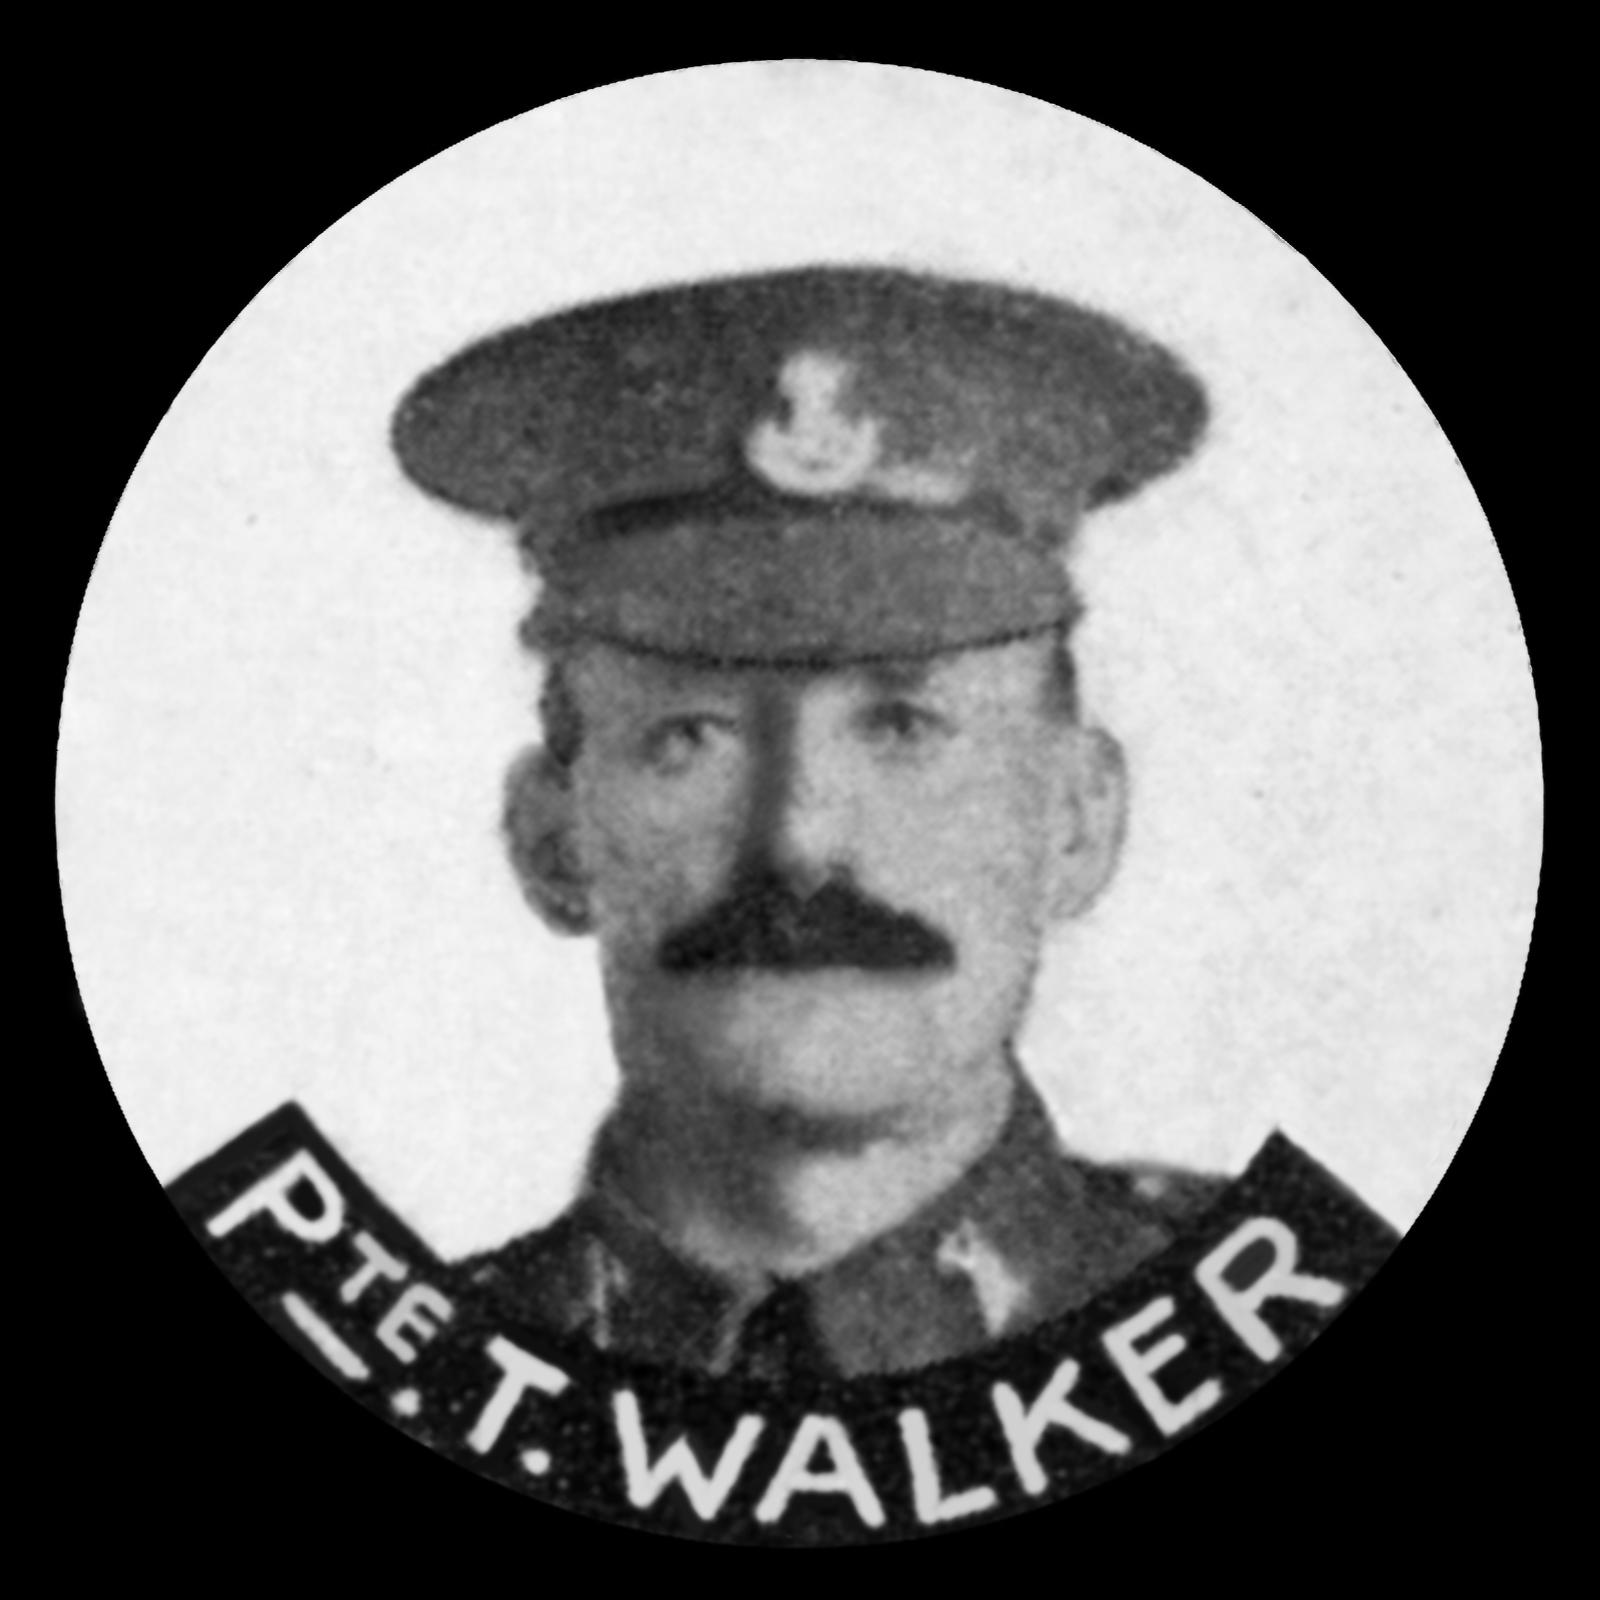 WALKER Thomas